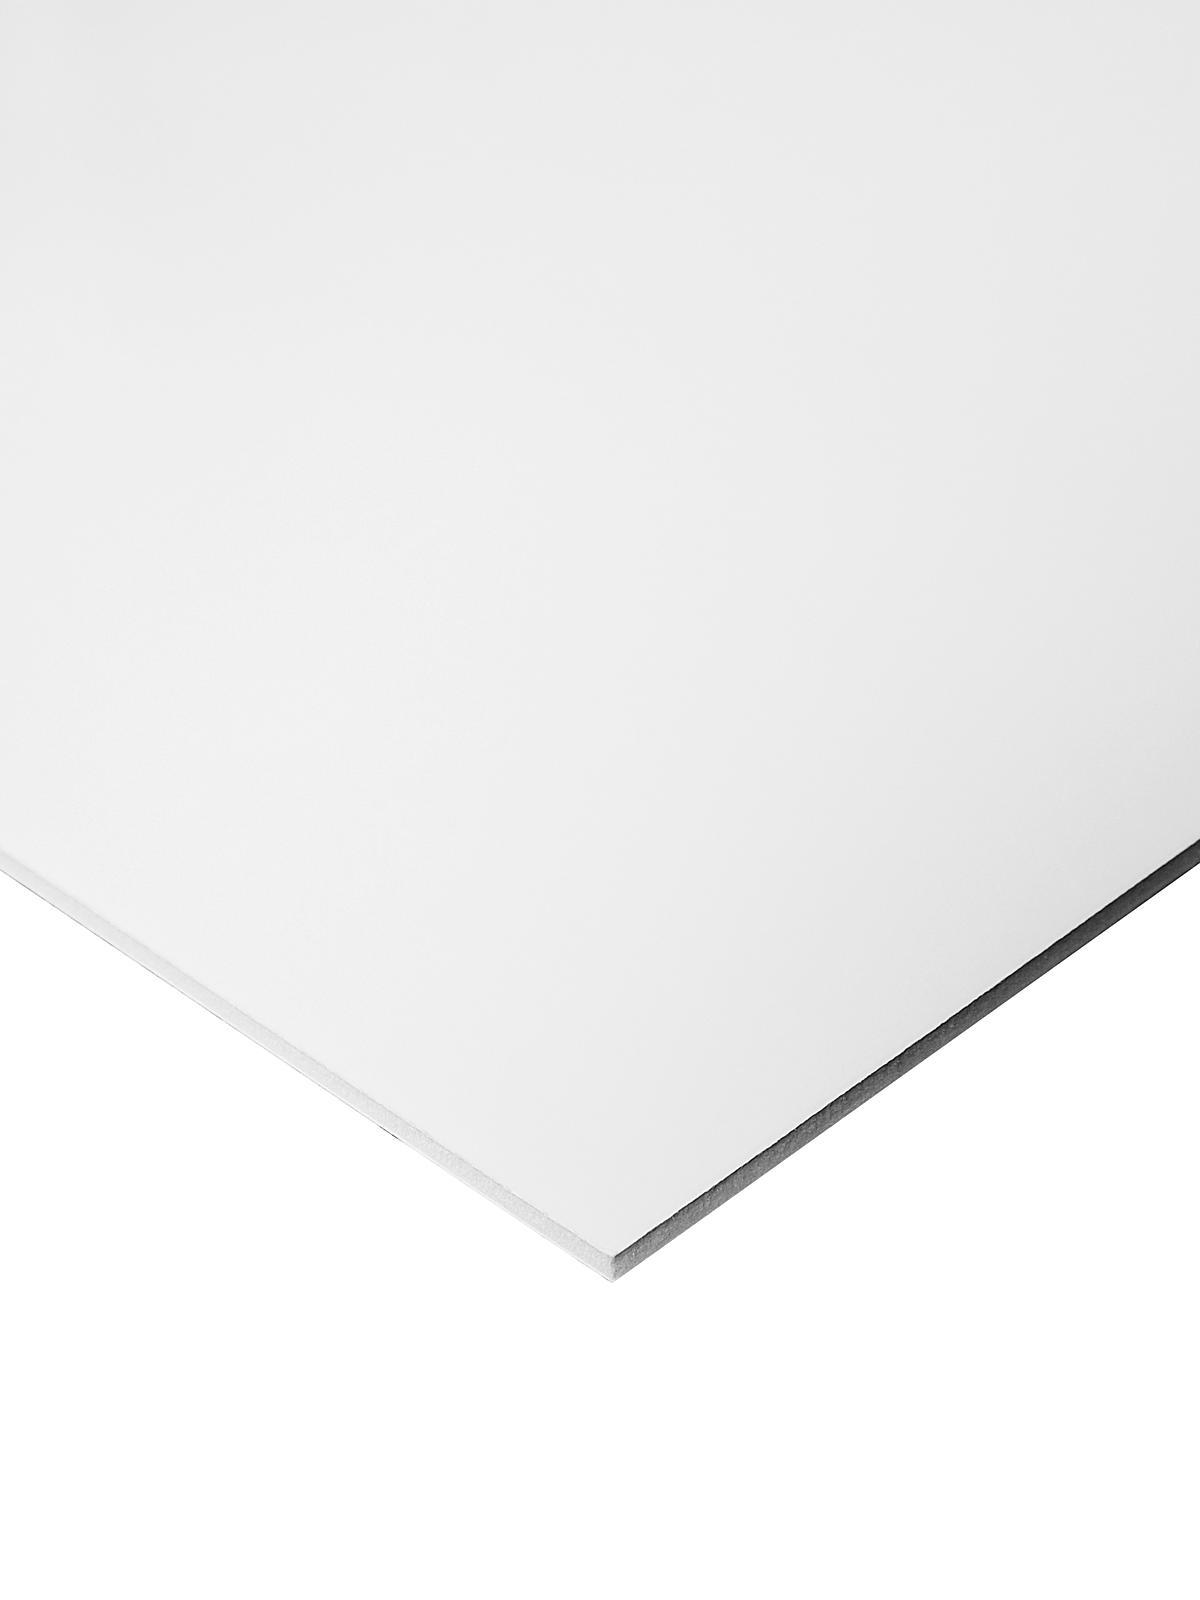 Fome-cor Board White 3 16 In. X 32 In. X 40 In. Each